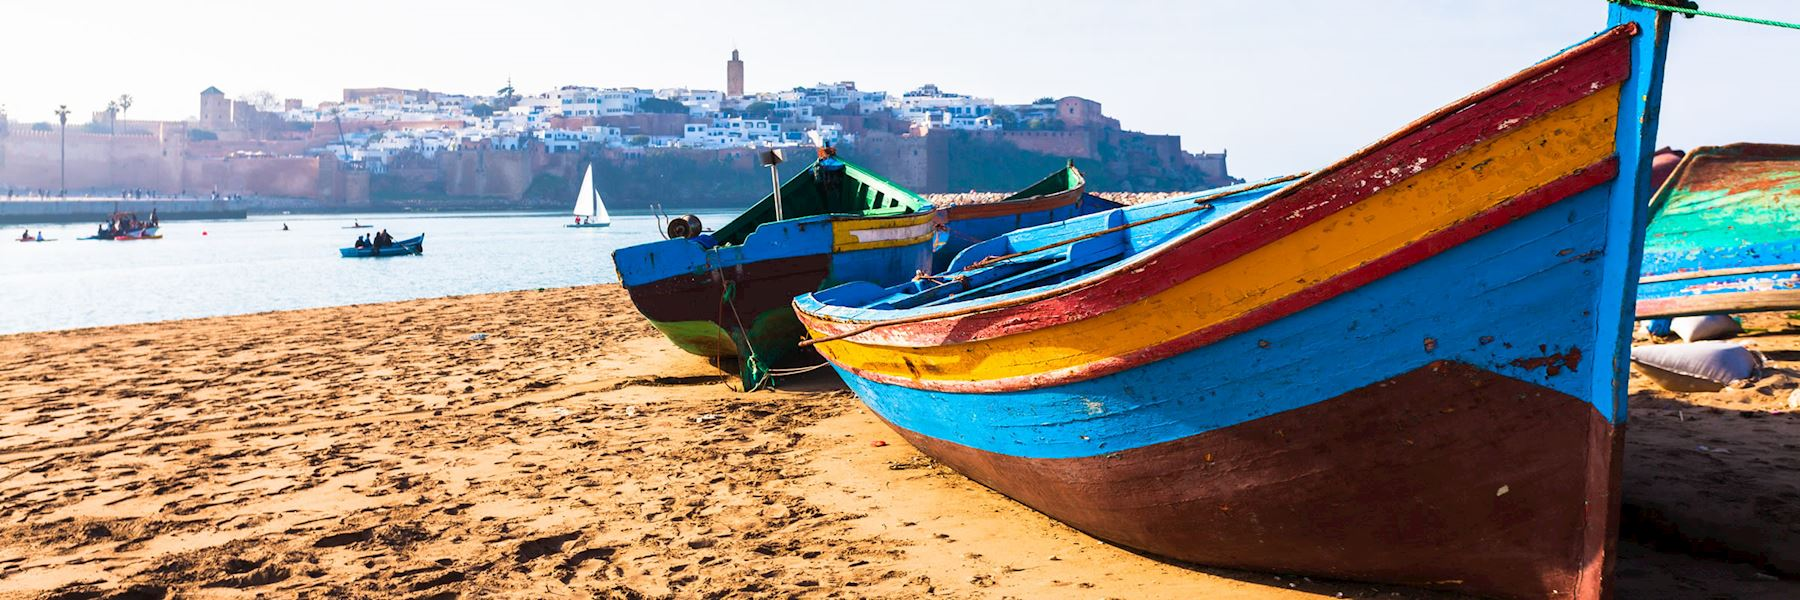 Visit Rabat, Morocco